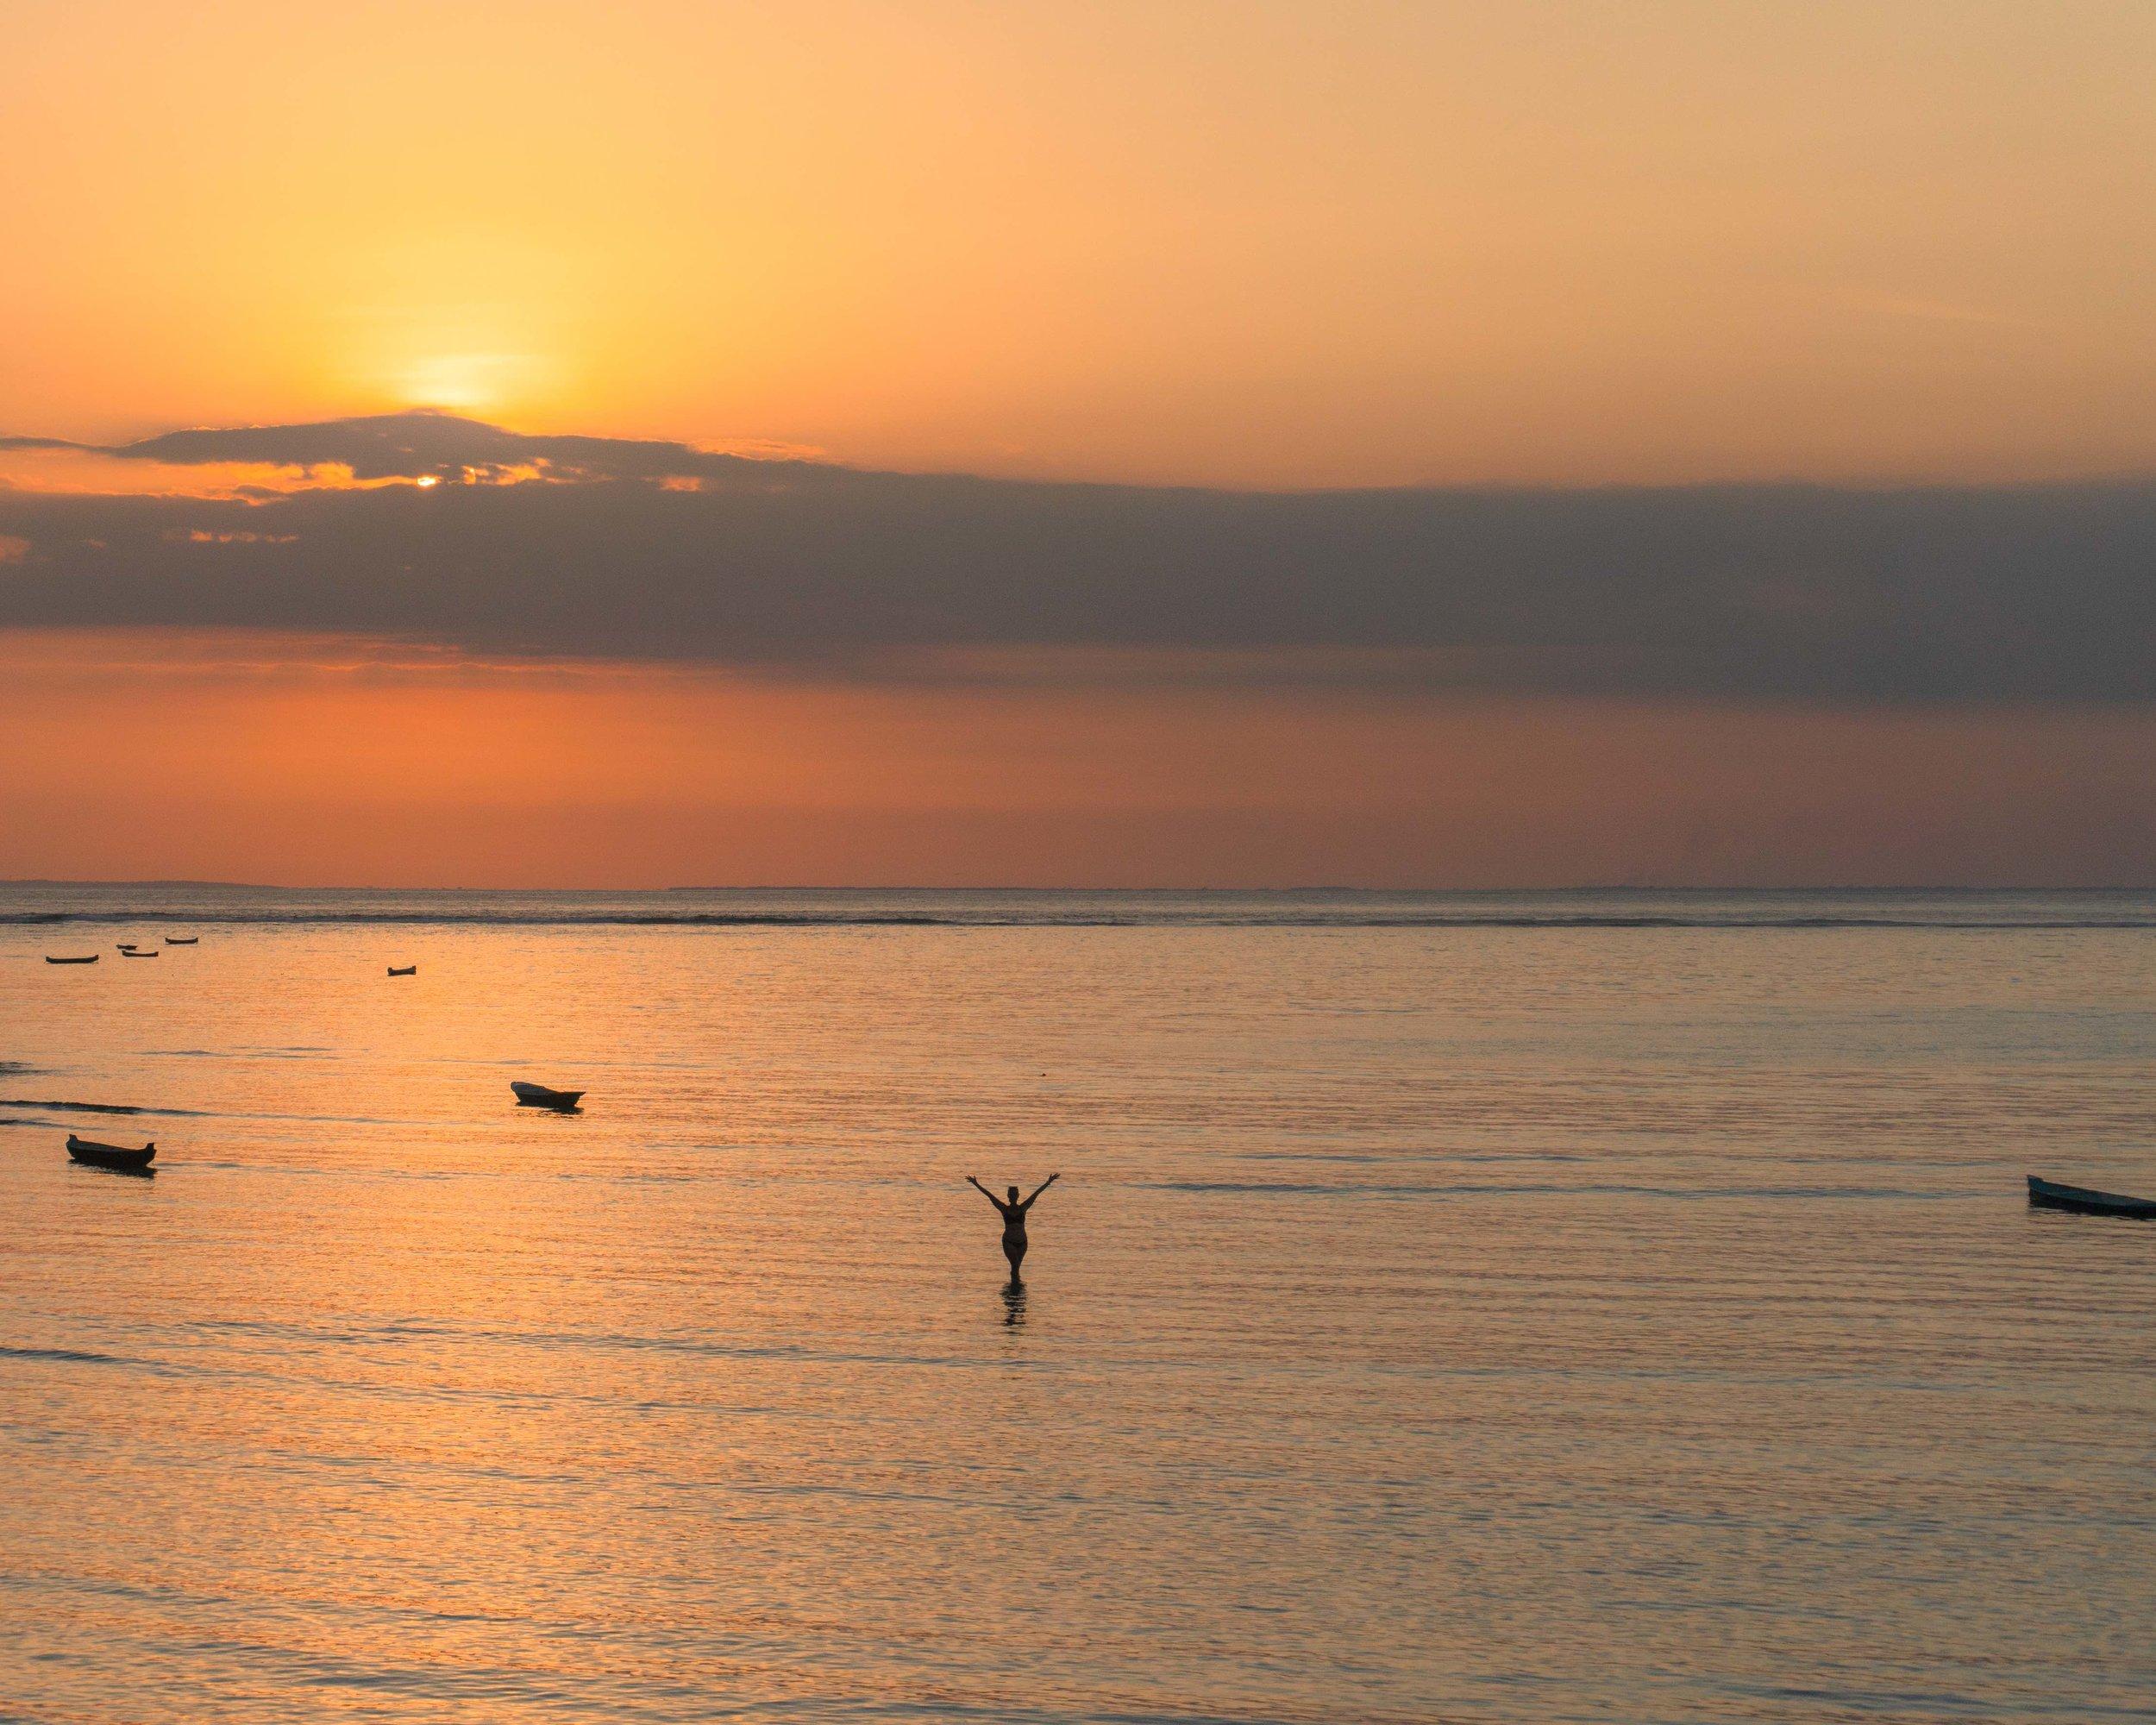 tropical_paradise_beach_island_bali_indonesia_sunset.jpg